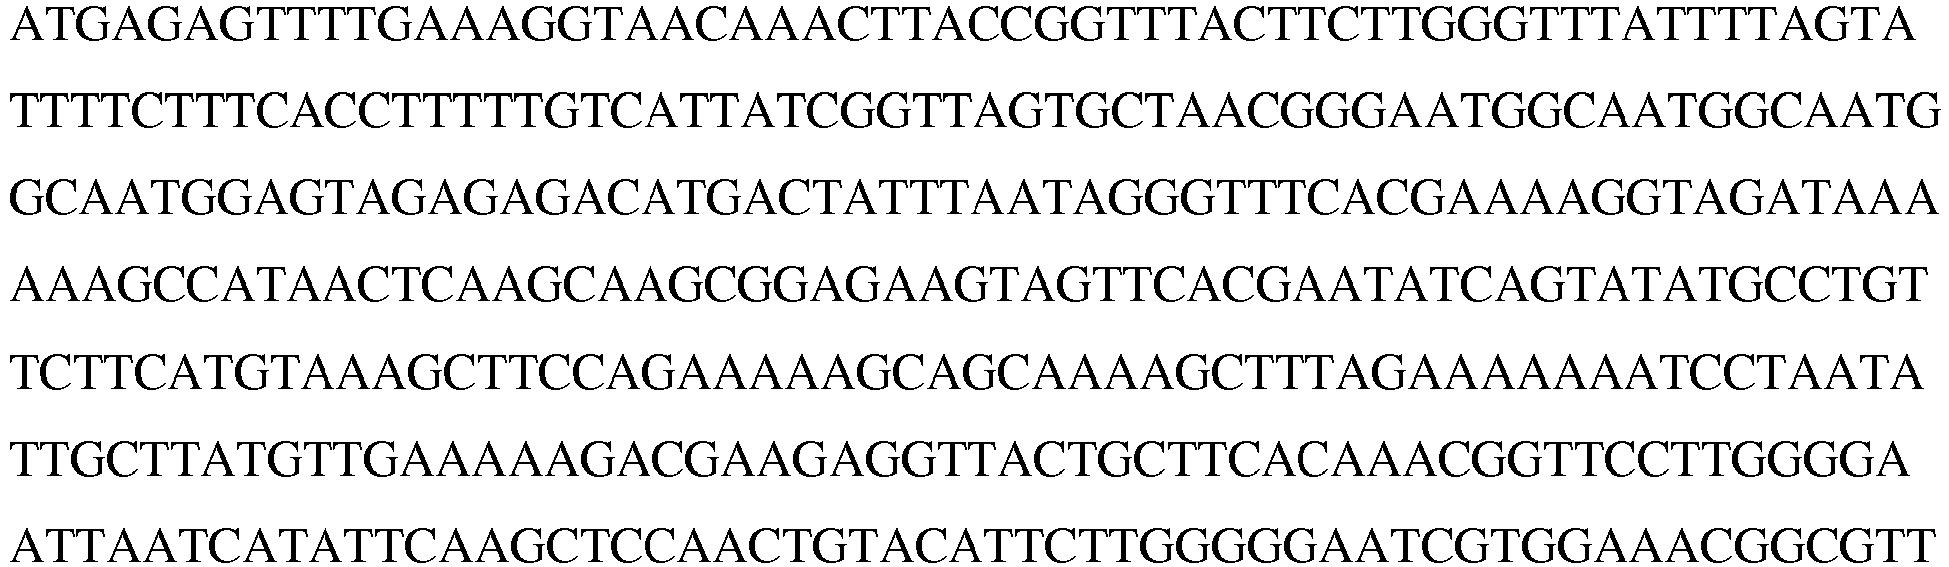 Figure imgb0042